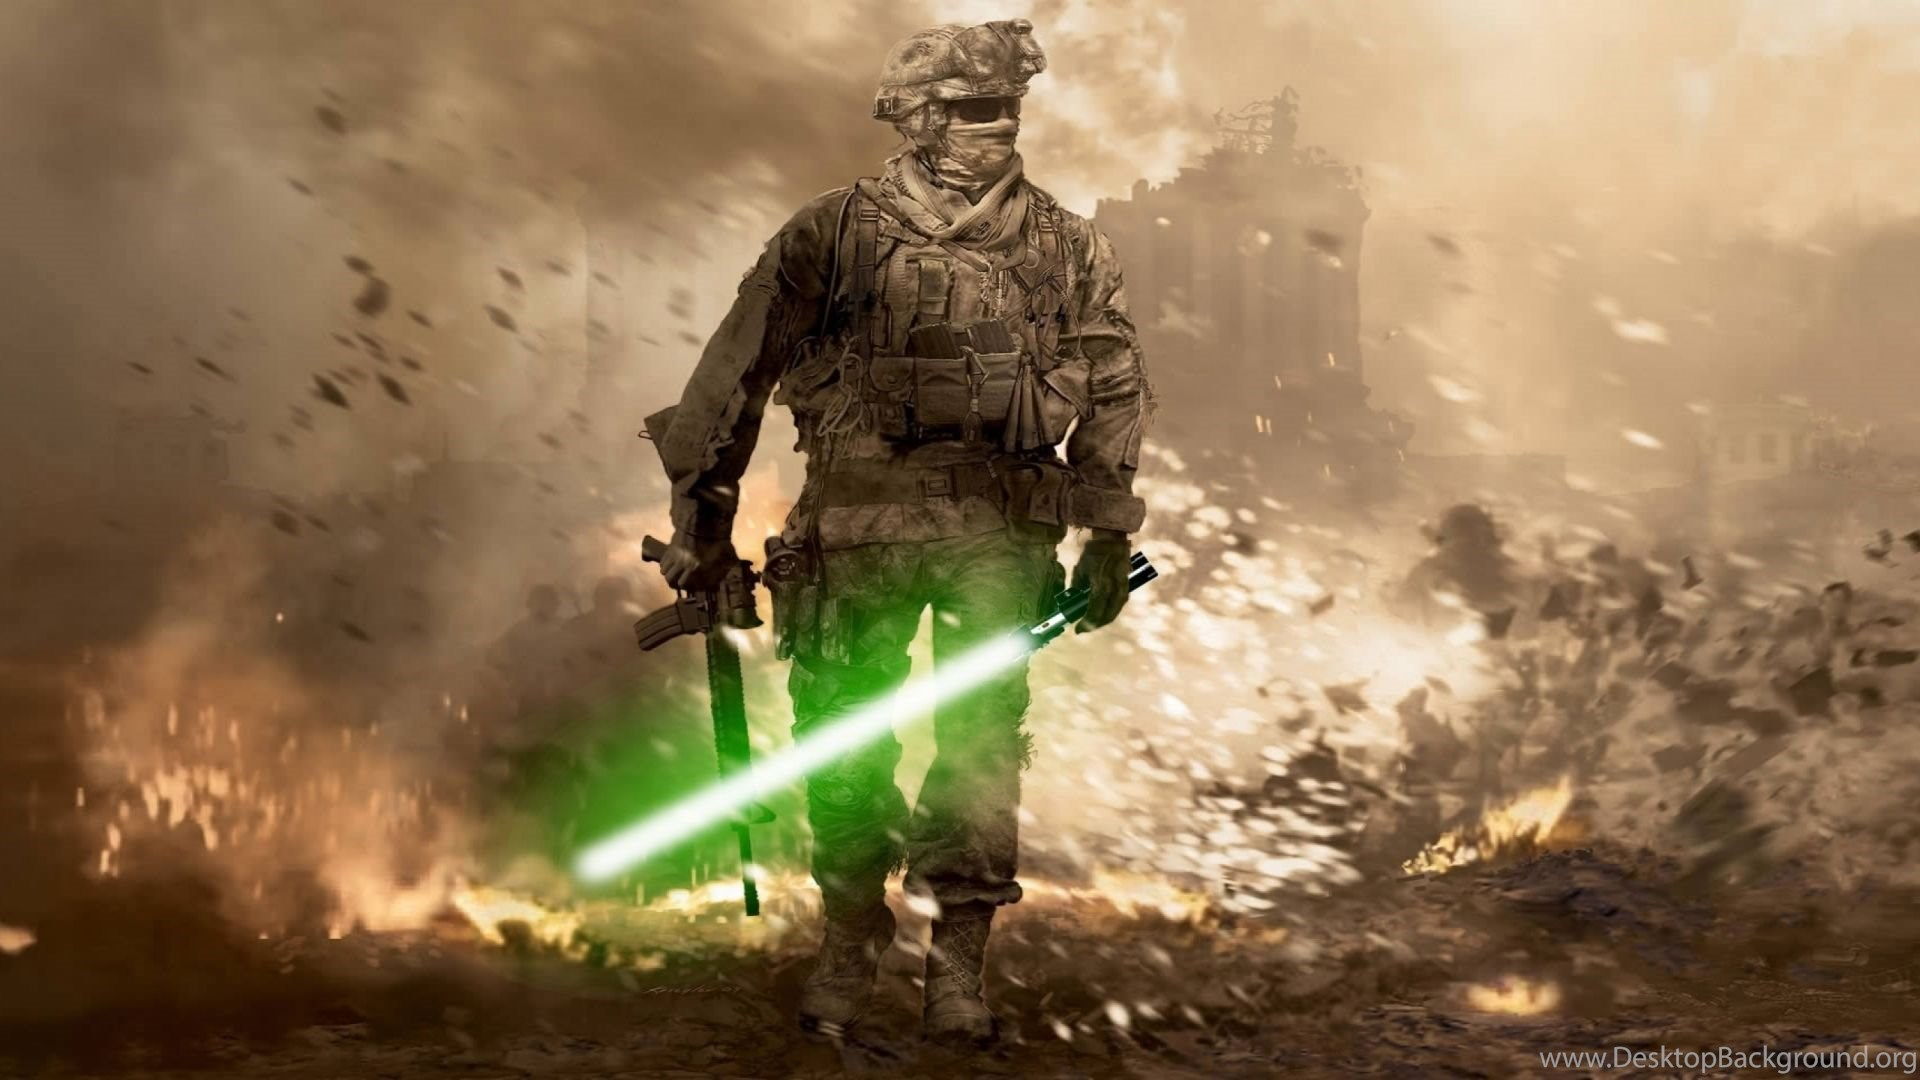 Call Of Duty Modern Warfare 2 Soldier Lightsaber Wallpapers